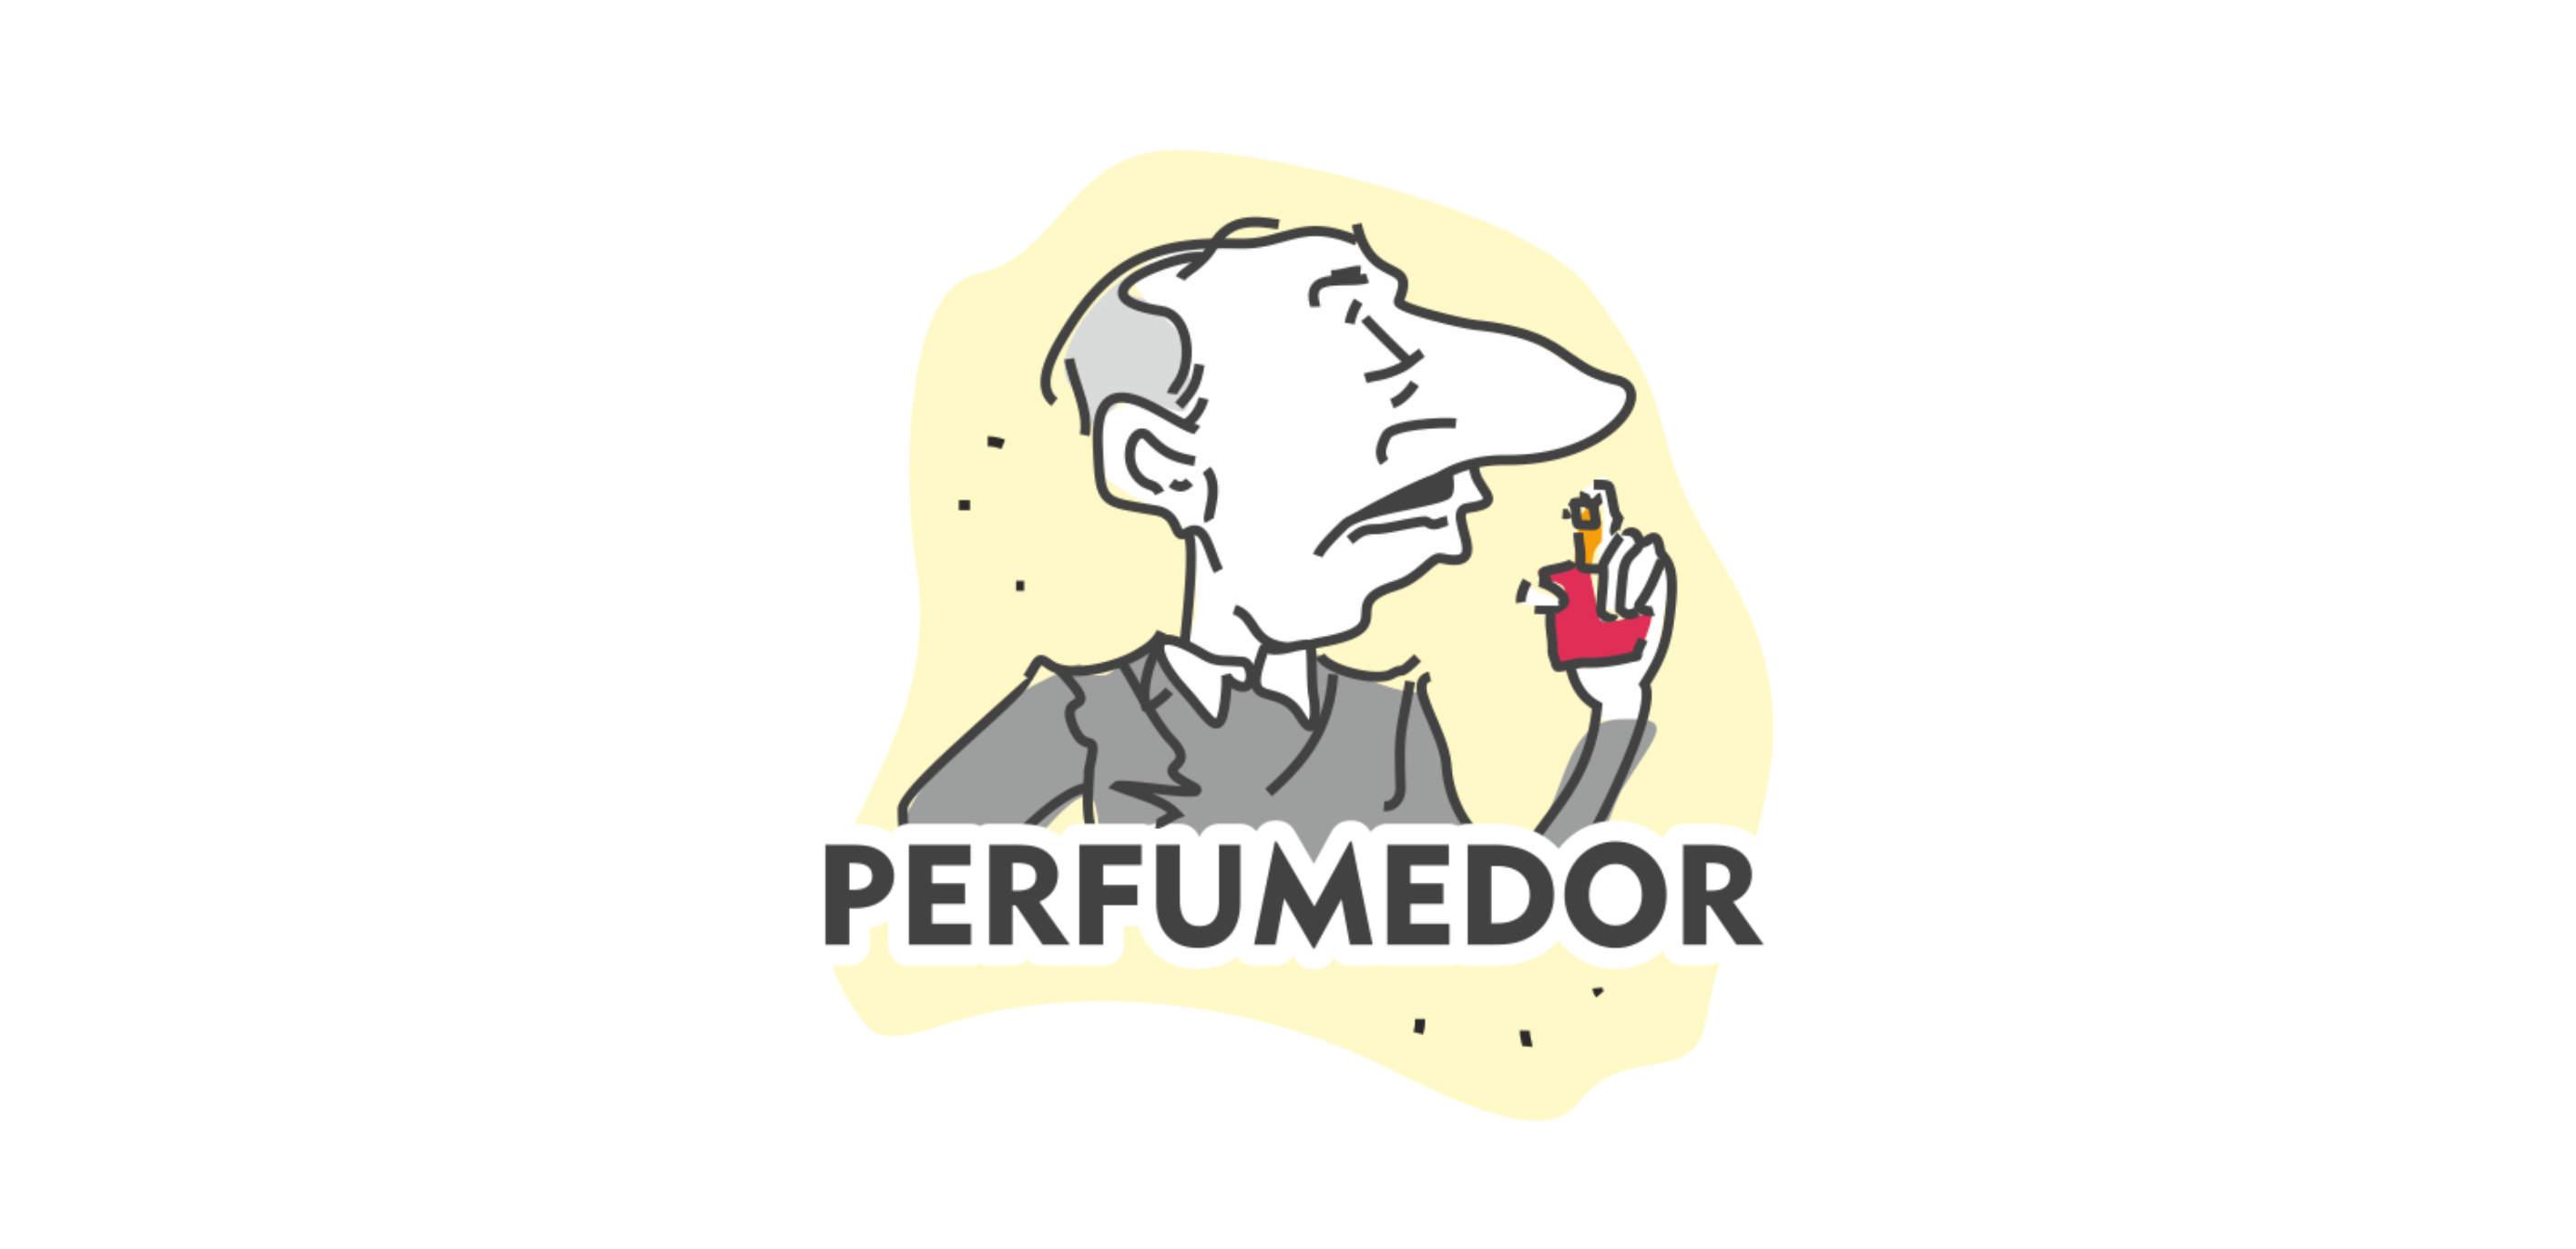 Логотип для интернет-магазина парфюмерии фото f_2665b49fe38733b5.jpg